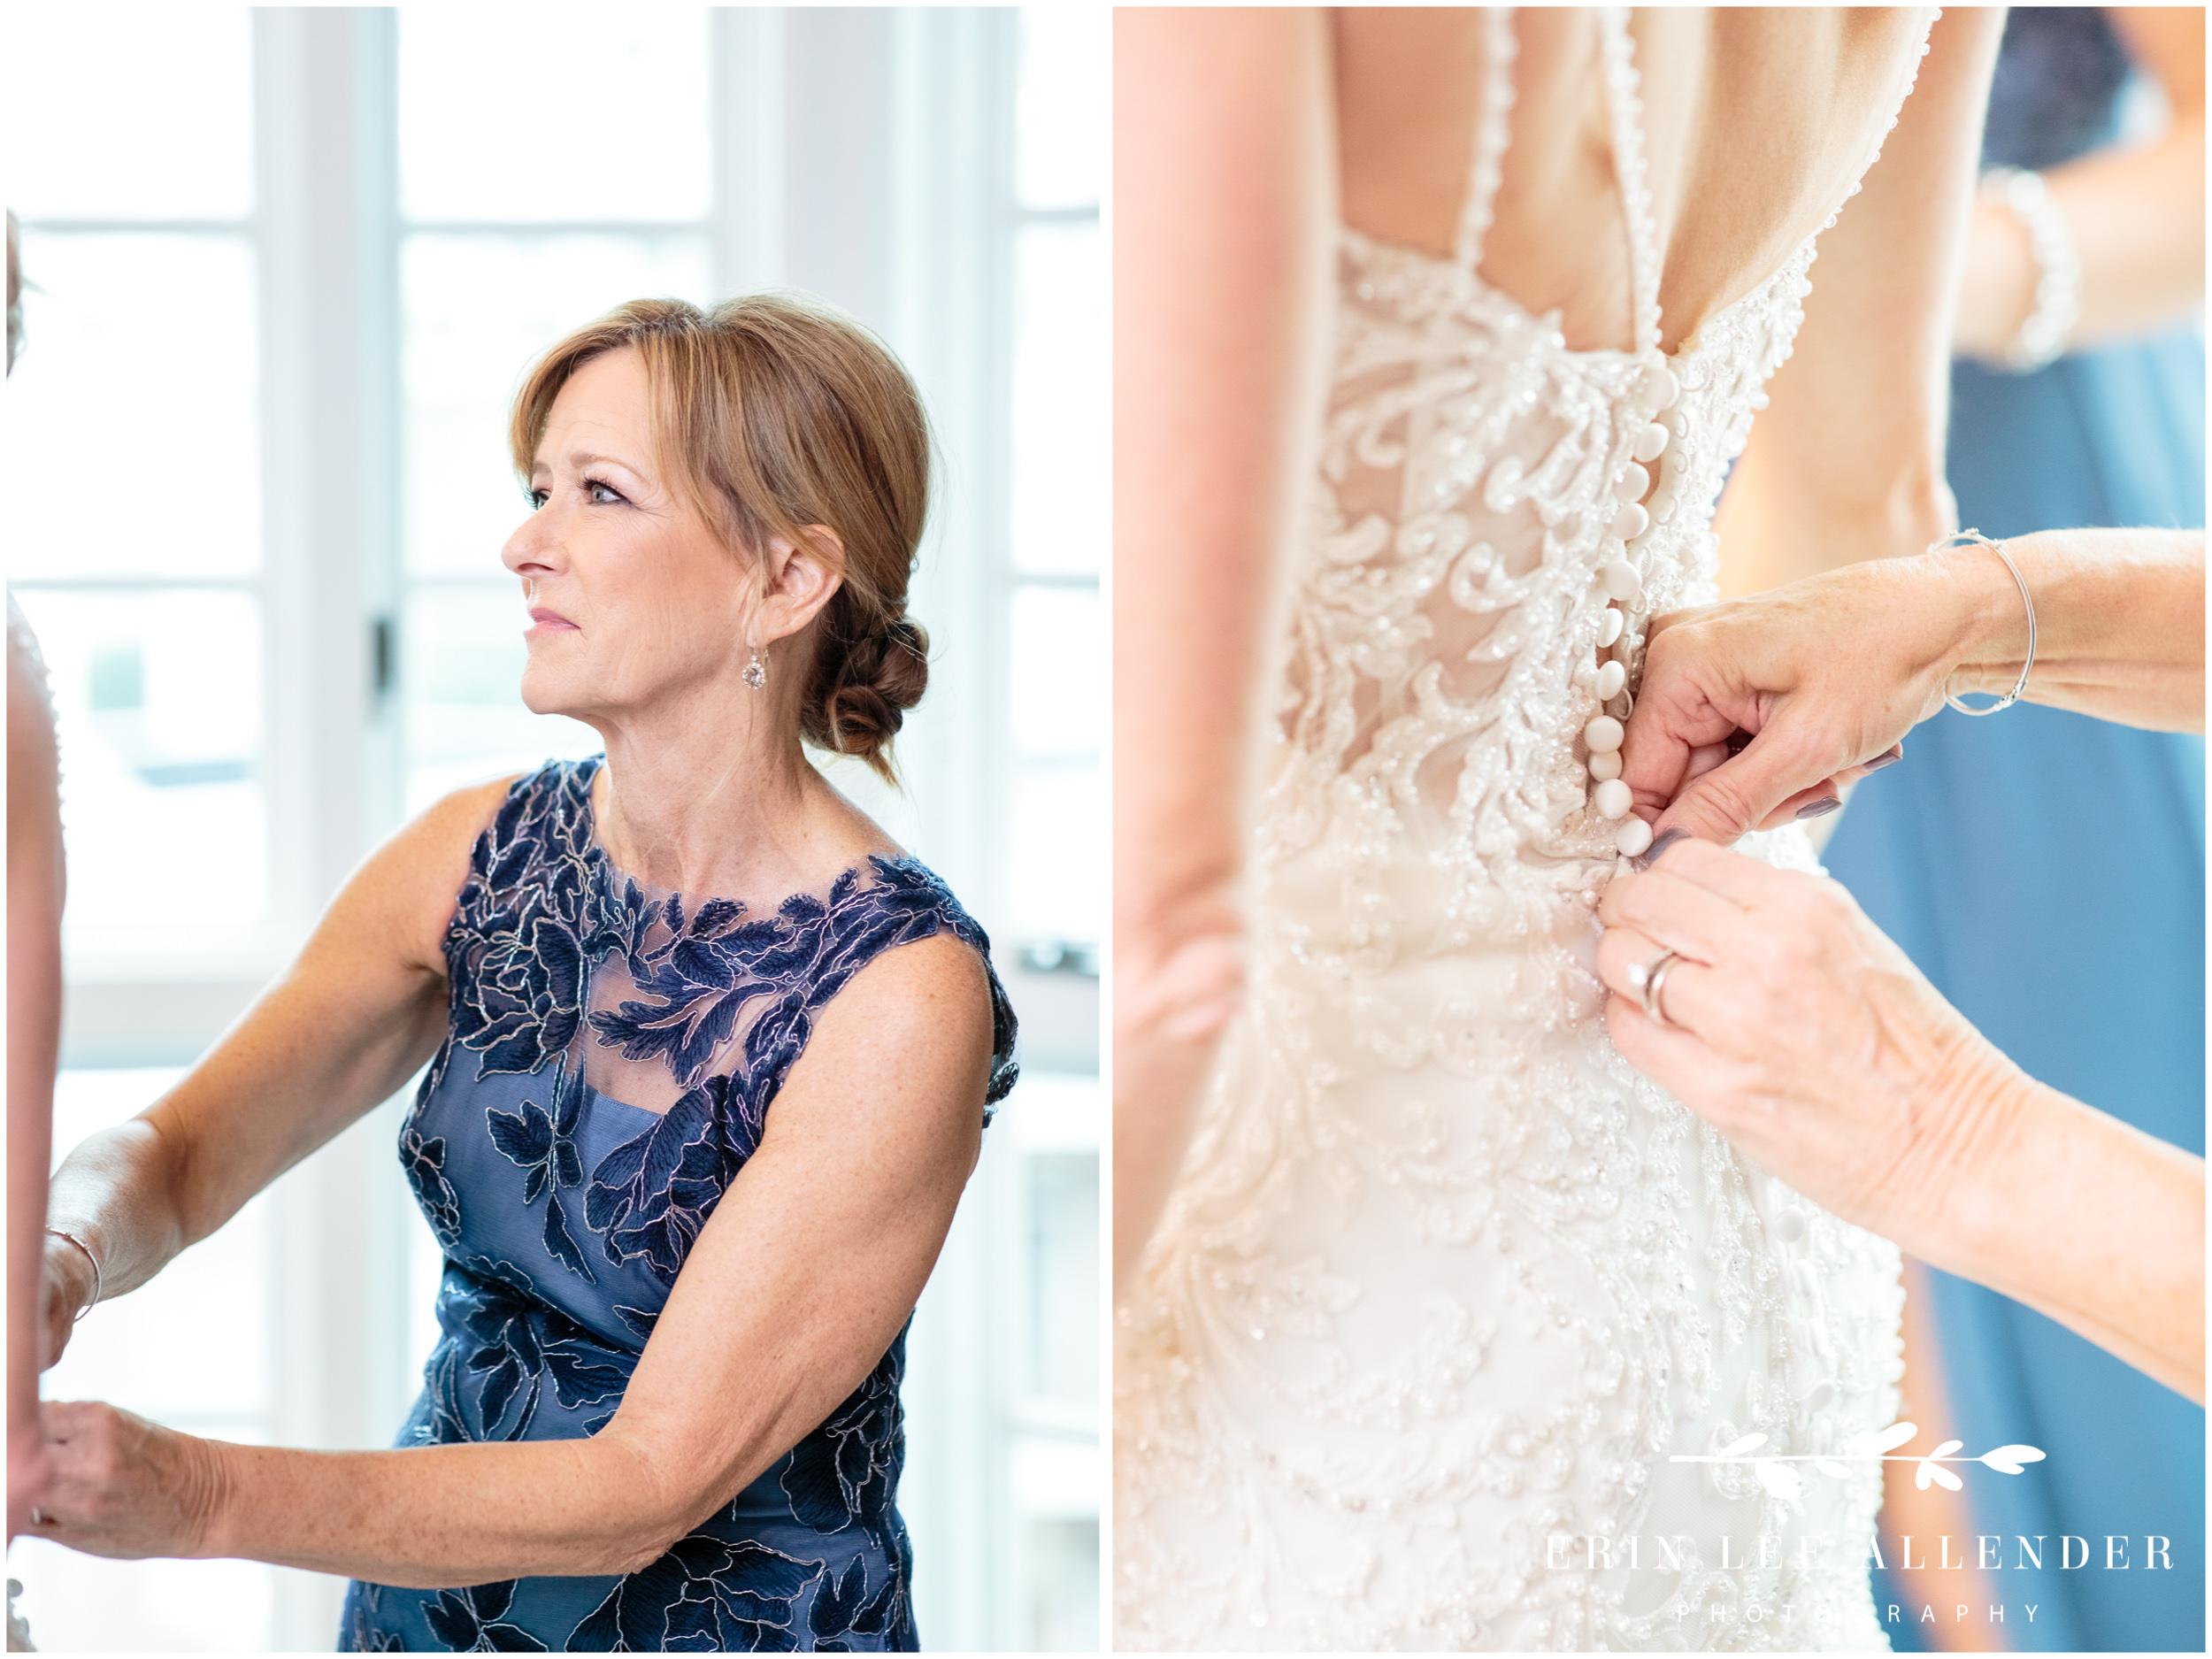 mother-buttoning-brides-dress